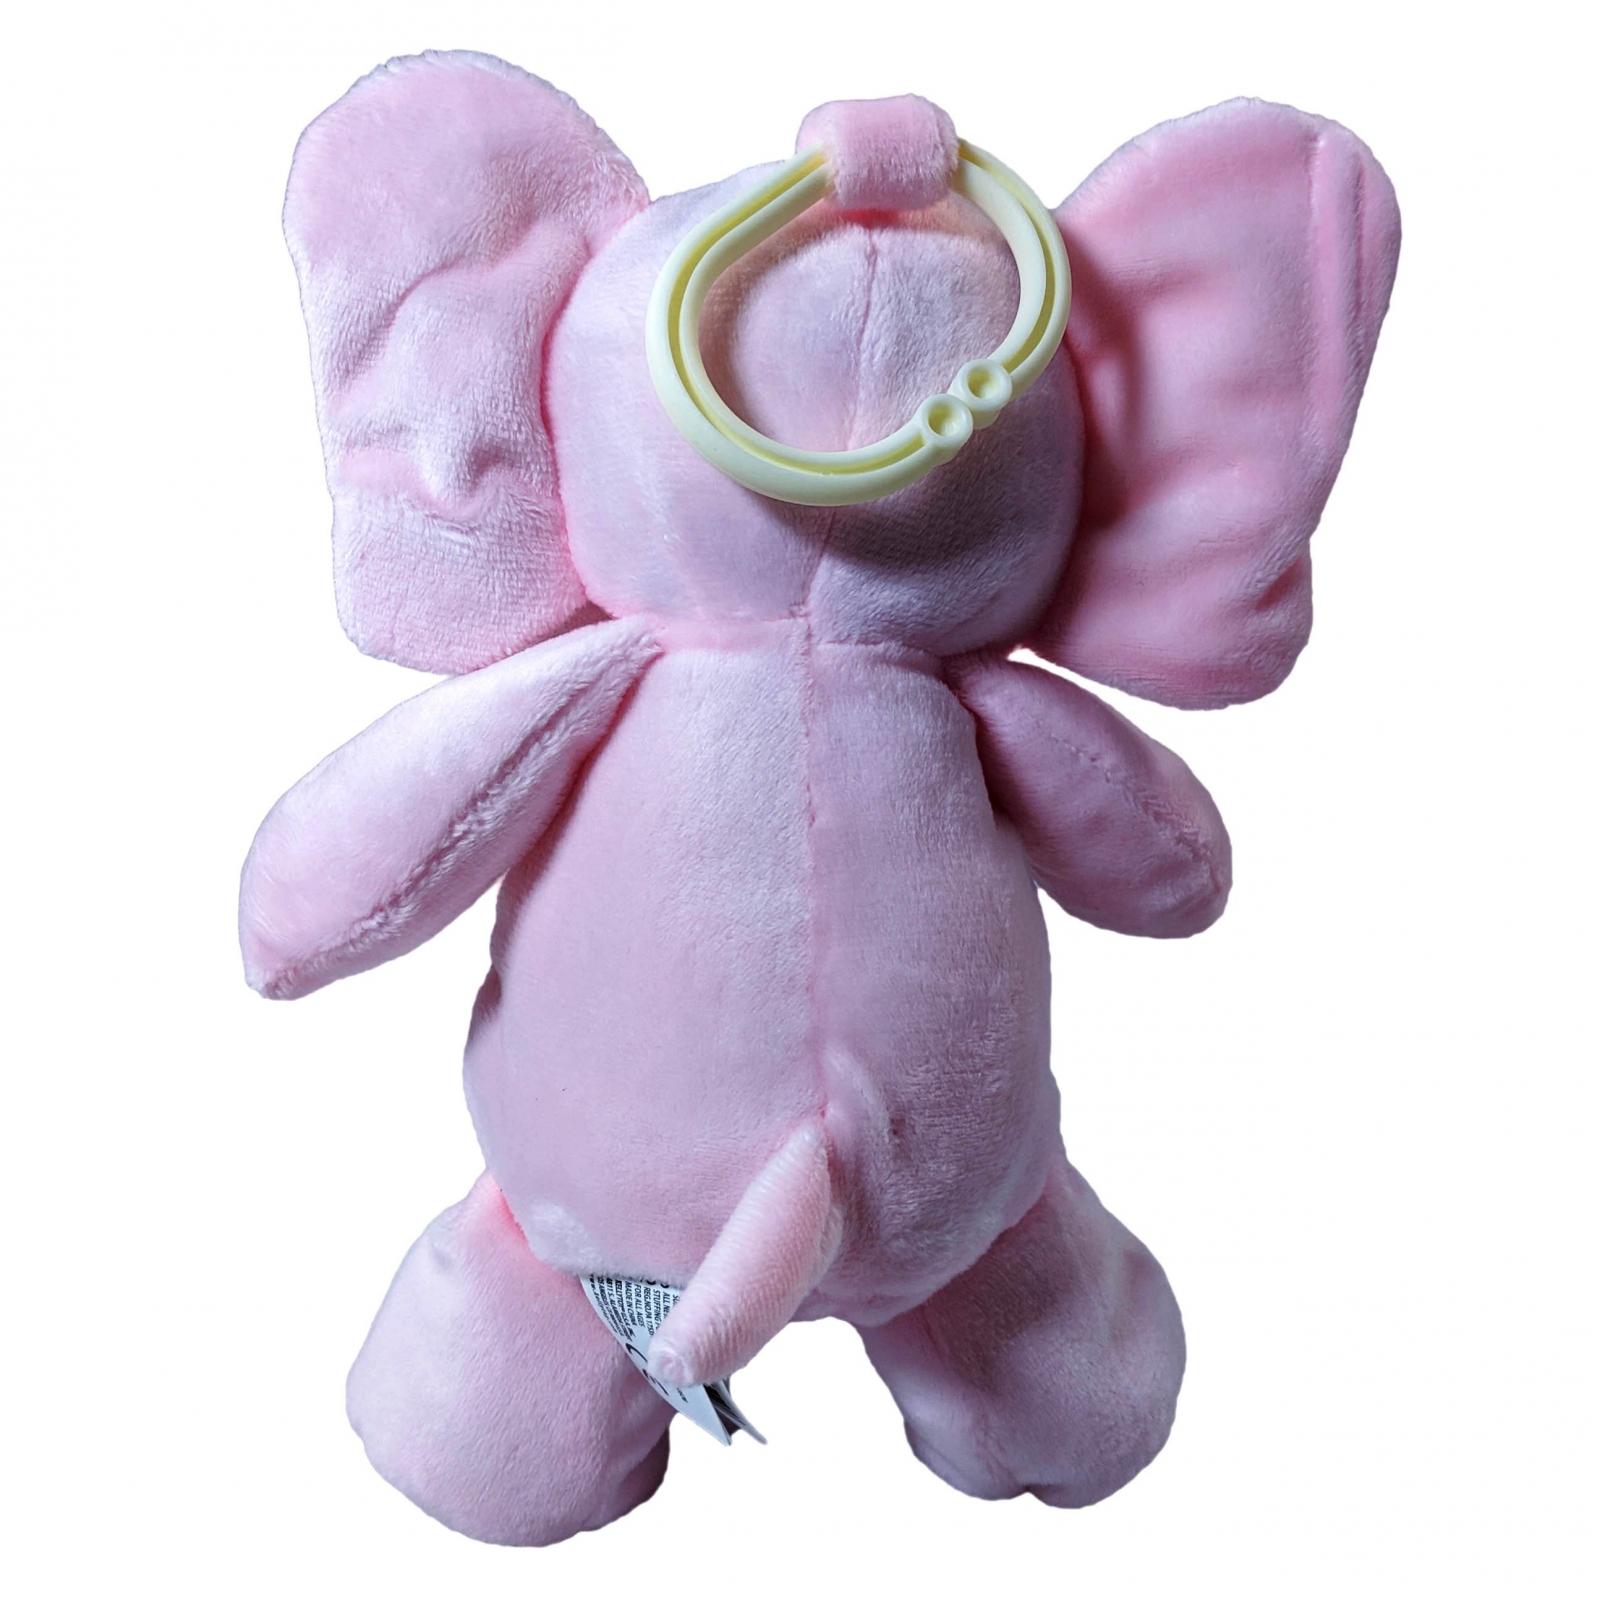 TychoTyke Clip On Baby Rattle Pram Accessory Pink Elephant